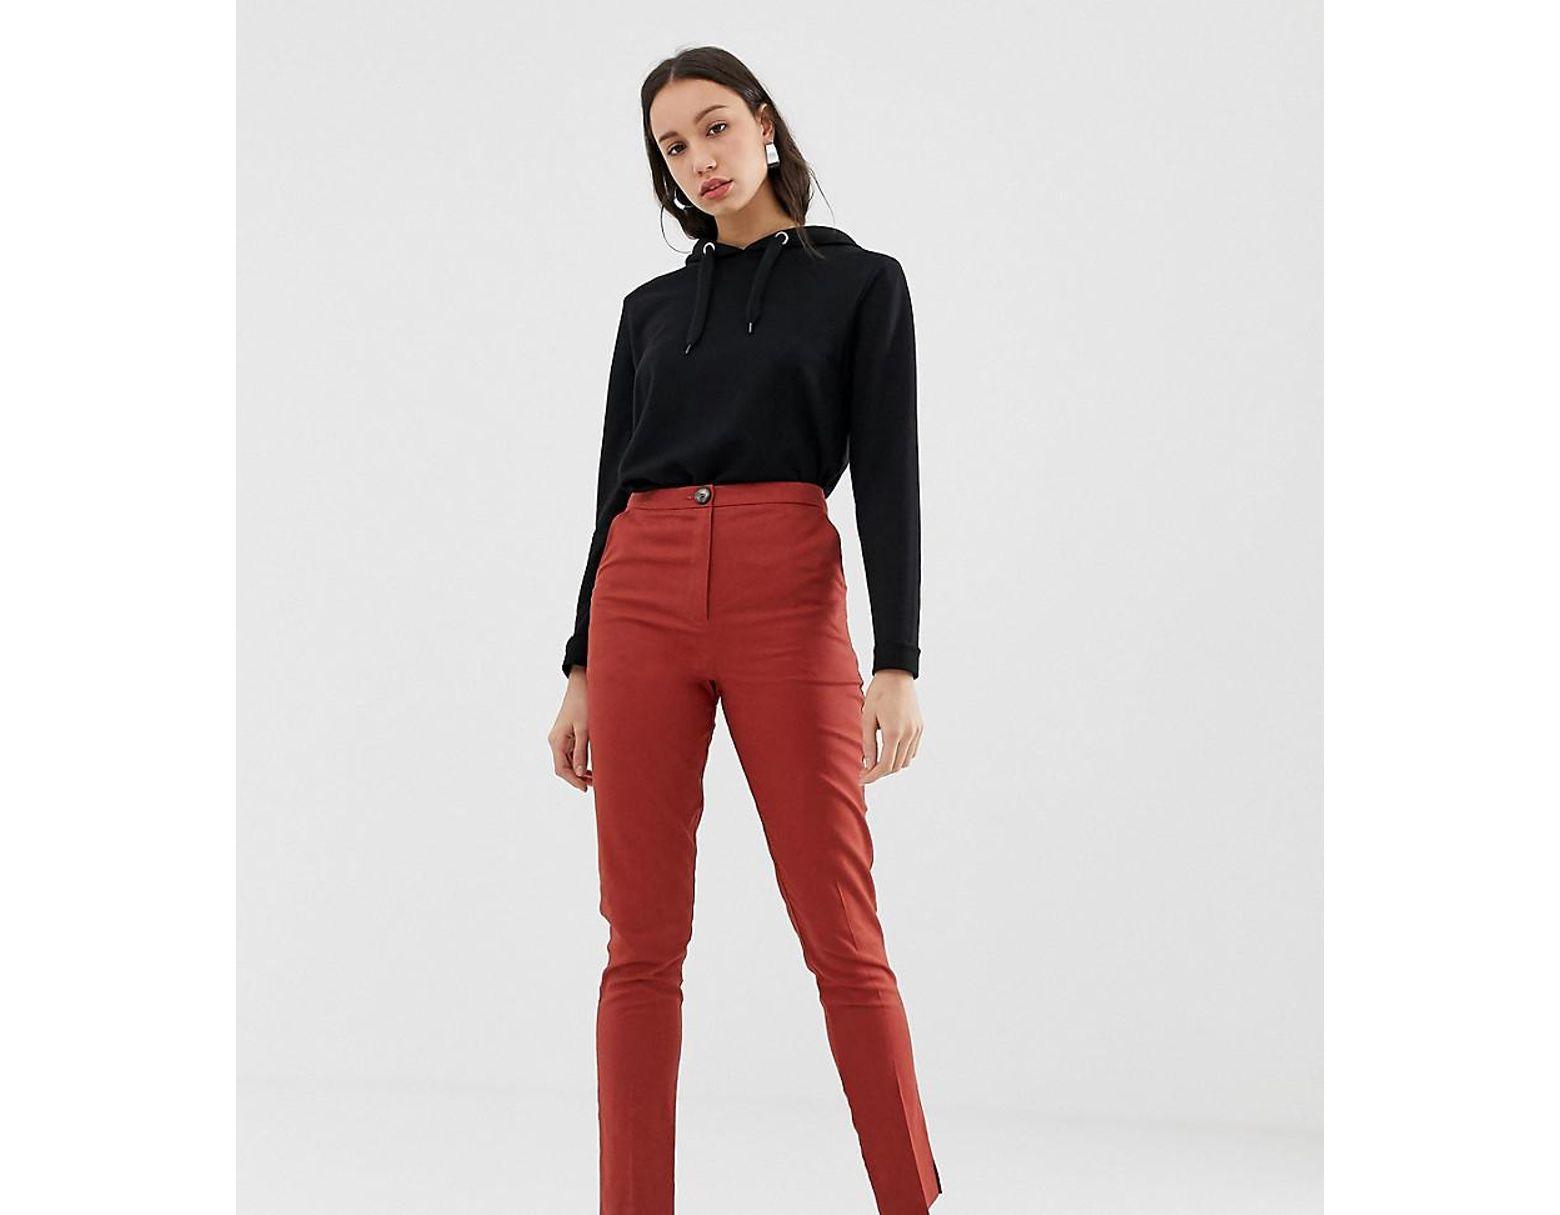 d5b7593519f4 ASOS Asos Design Tall Linen Clean Cigarette Trouser in Red - Lyst